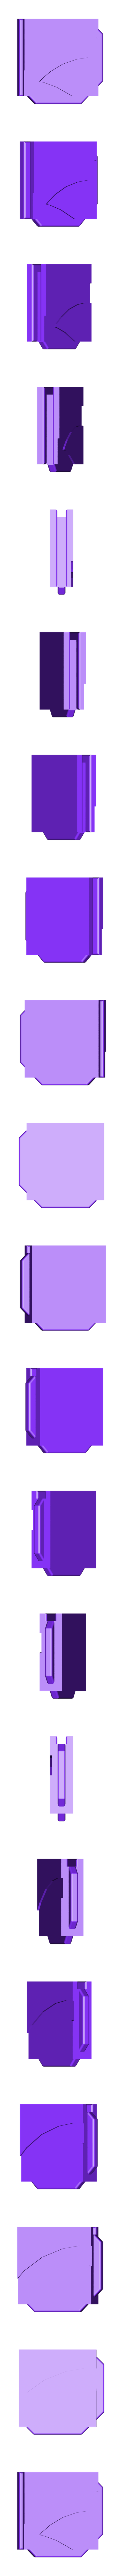 Piece - Part 2.stl Download free STL file Taquin CULTS / Sliding Puzzle • 3D print model, Valelab3D